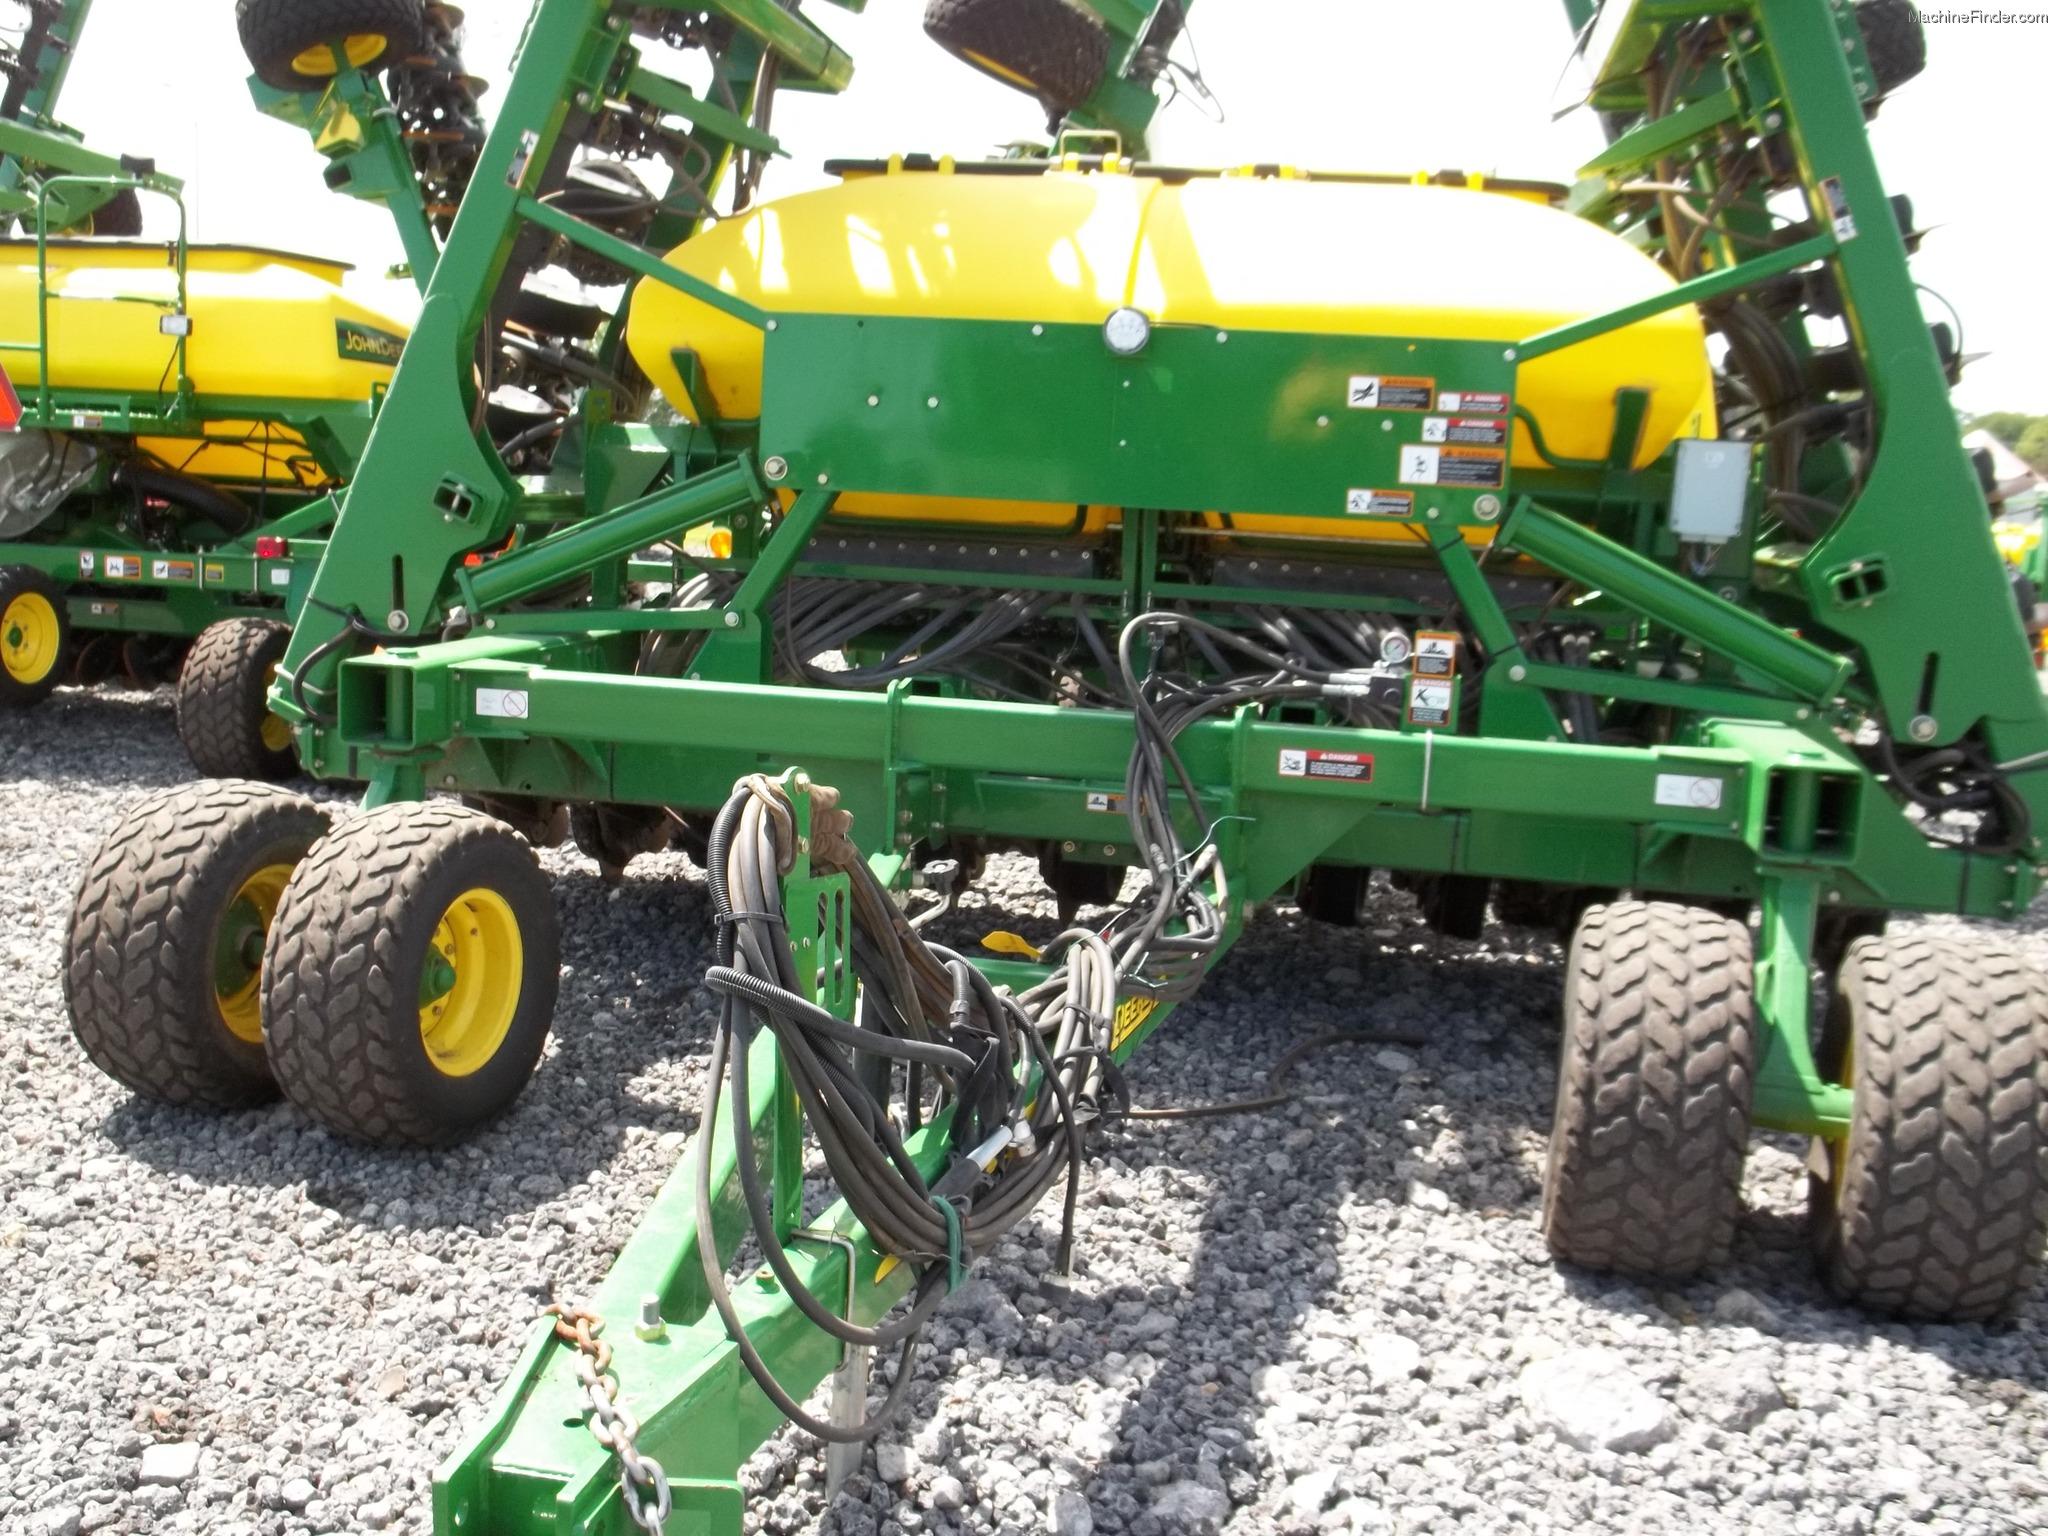 2008 John Deere 1990CCS Planting & Seeding - Air Drills ...